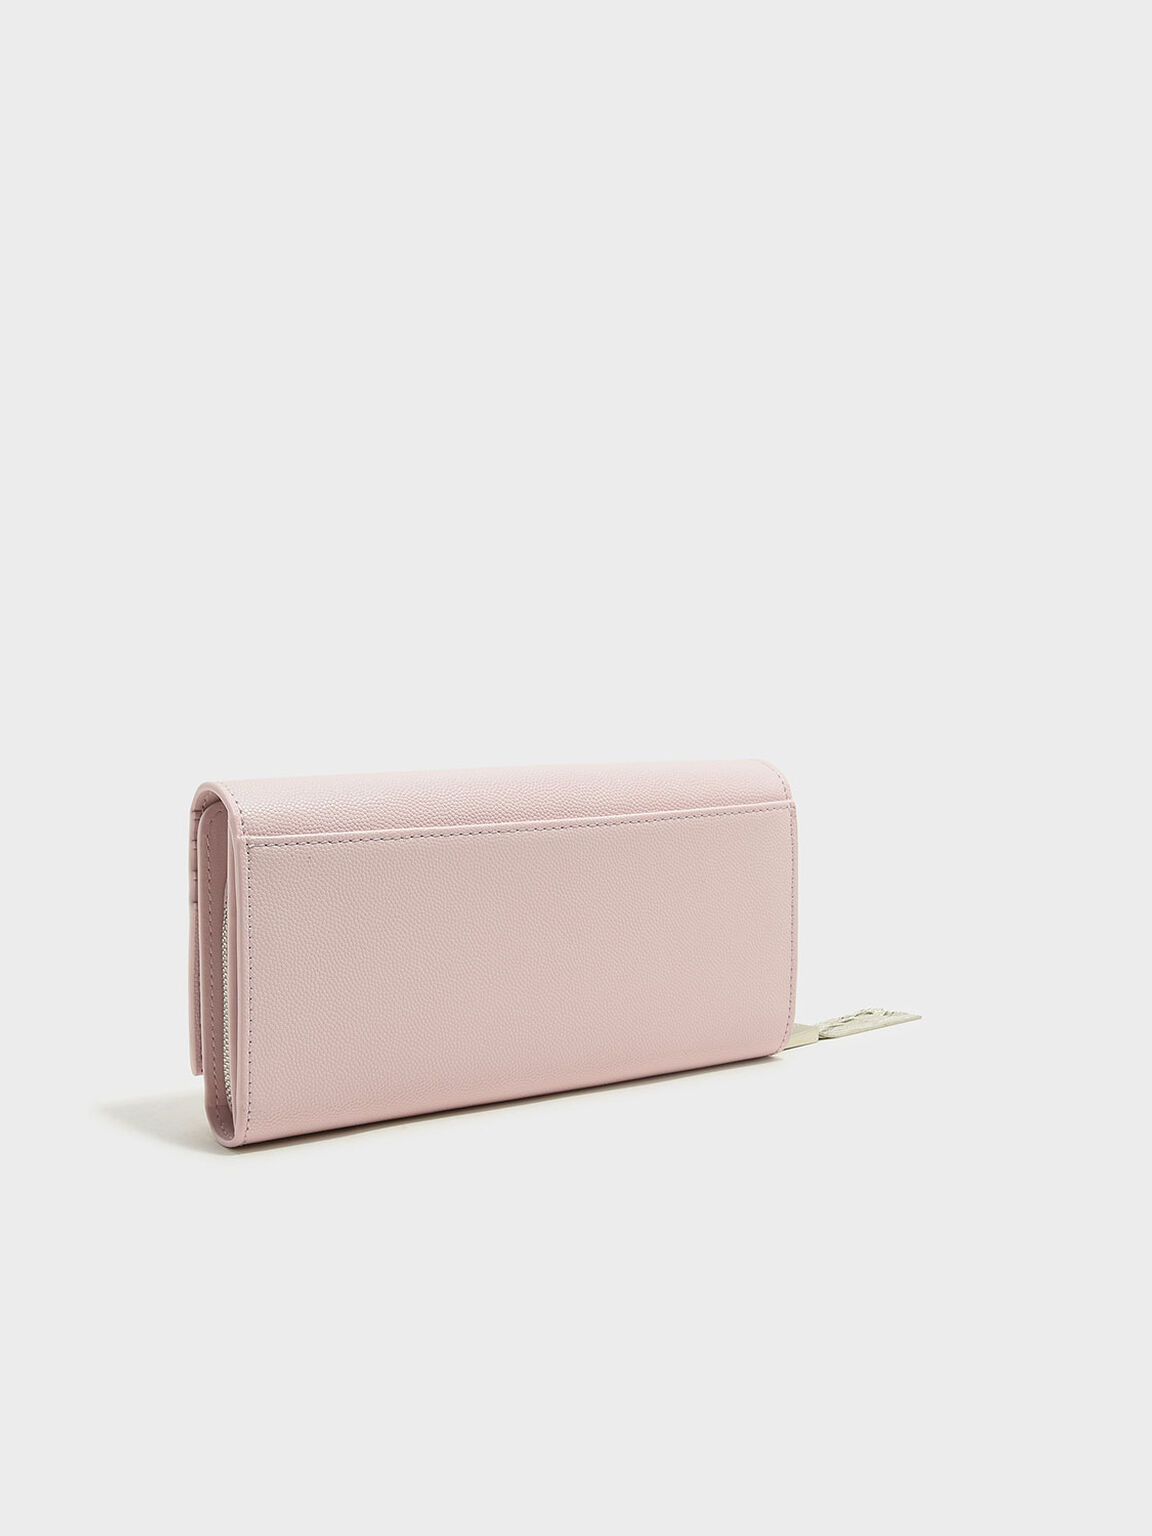 流蘇拉鍊長夾, 粉紅色, hi-res